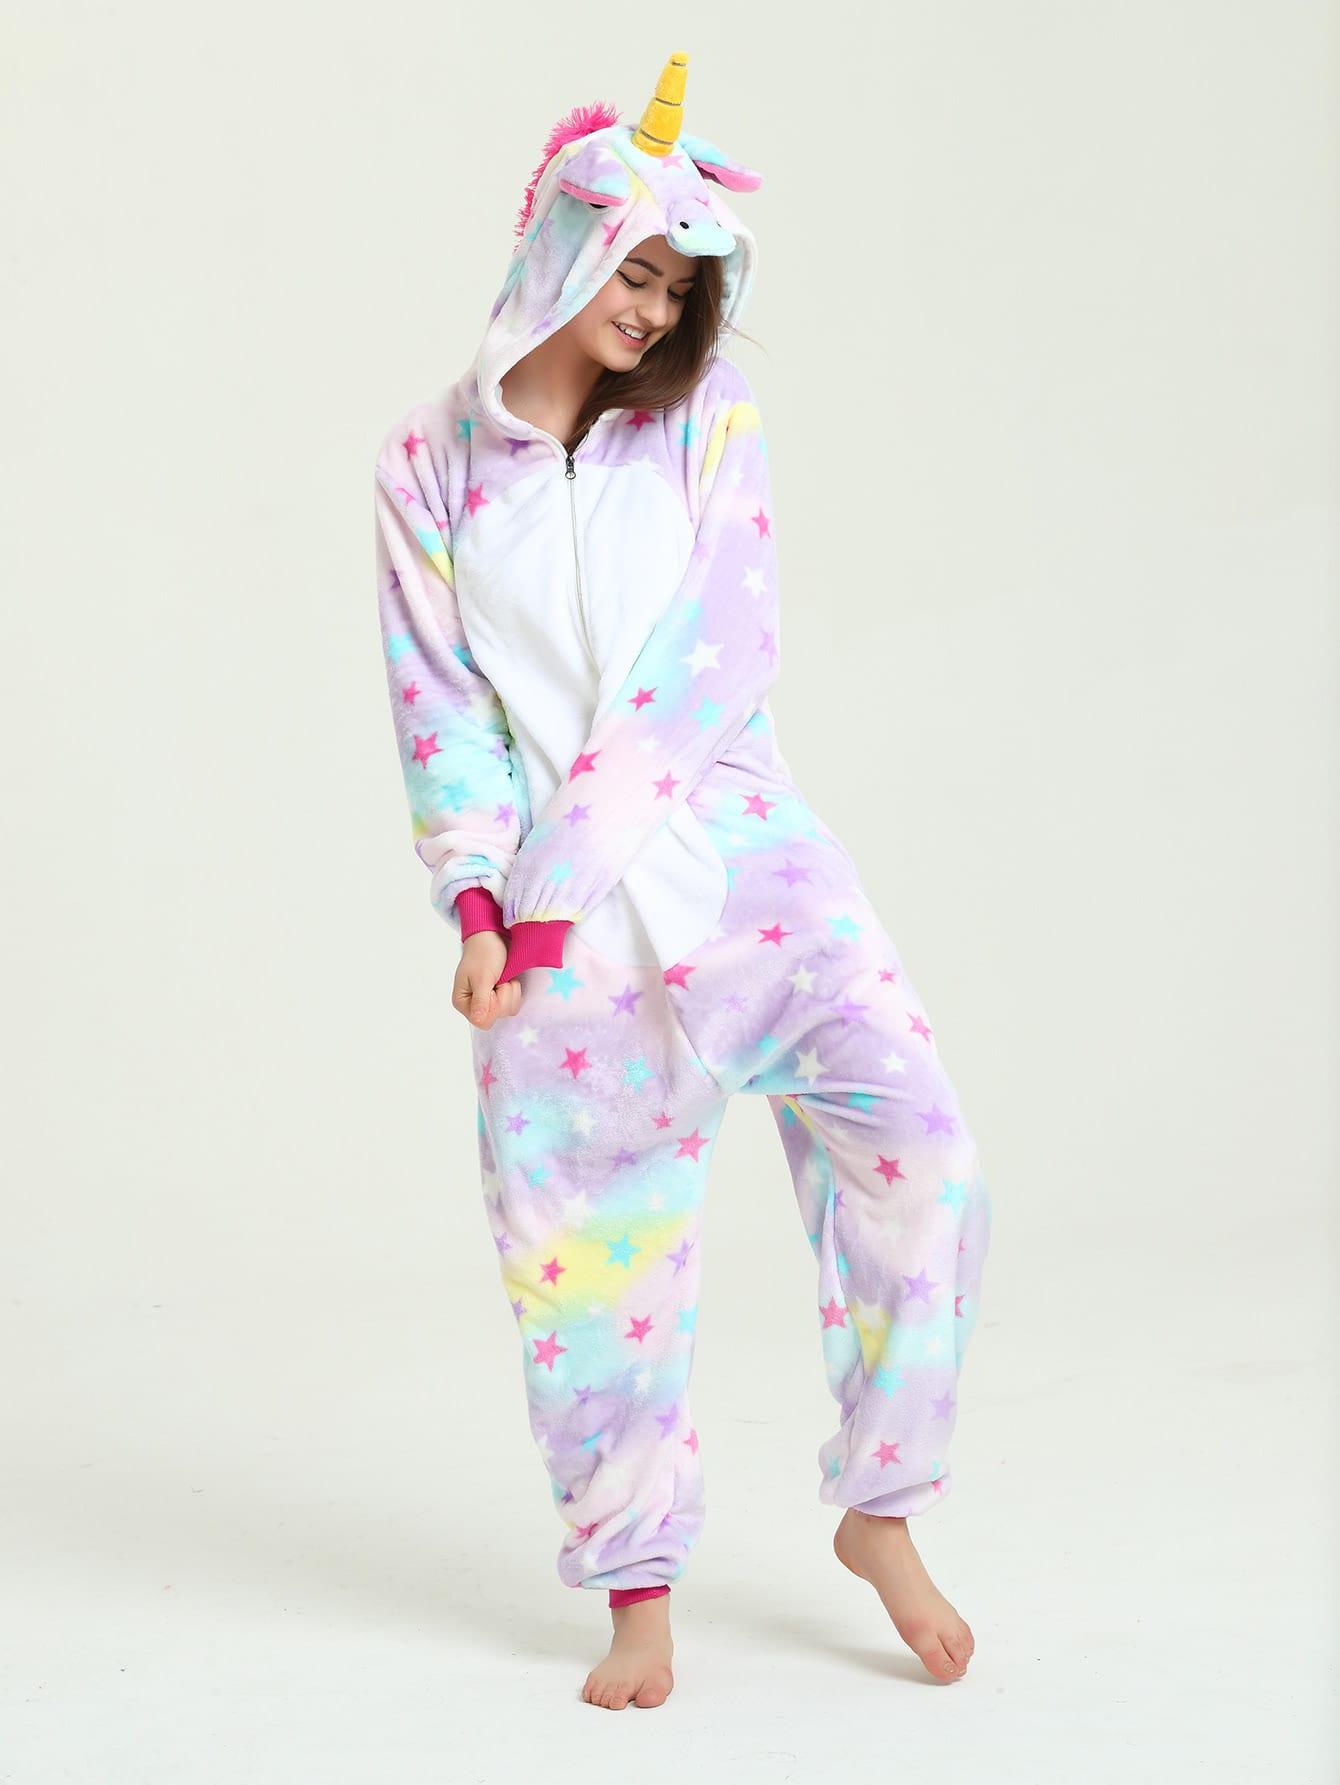 Star Print Unicorn Onesie EmmaCloth-Women Fast Fashion Online